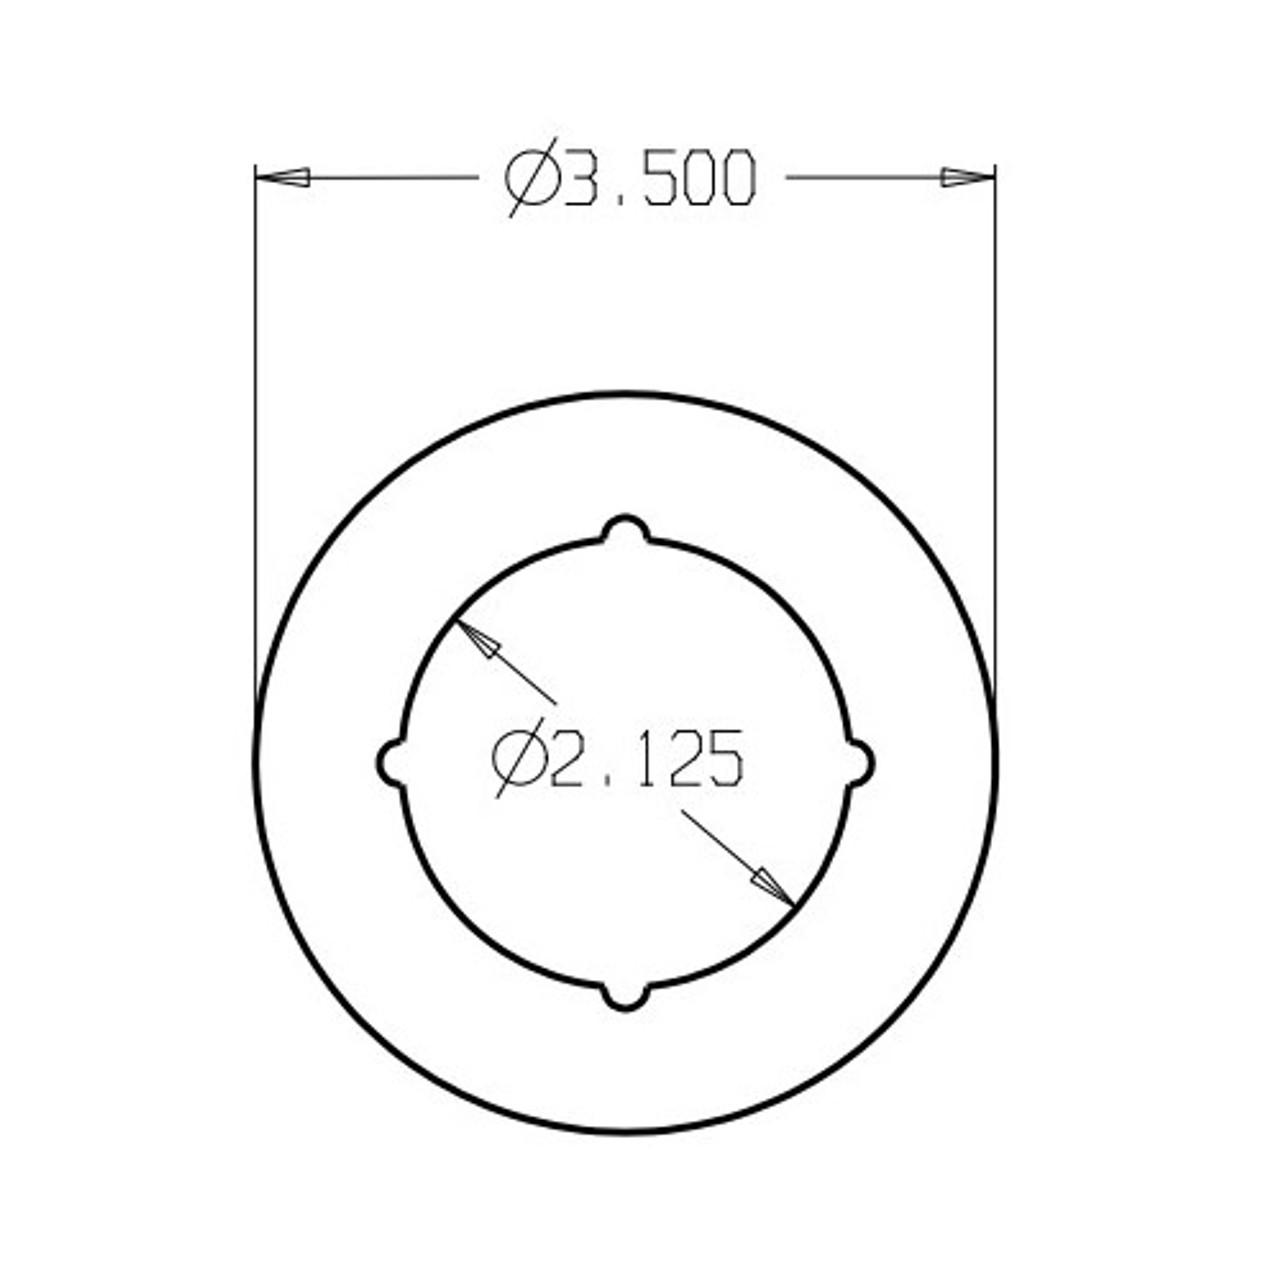 SP-135-630 Don Jo Scar Plate Dimensional View